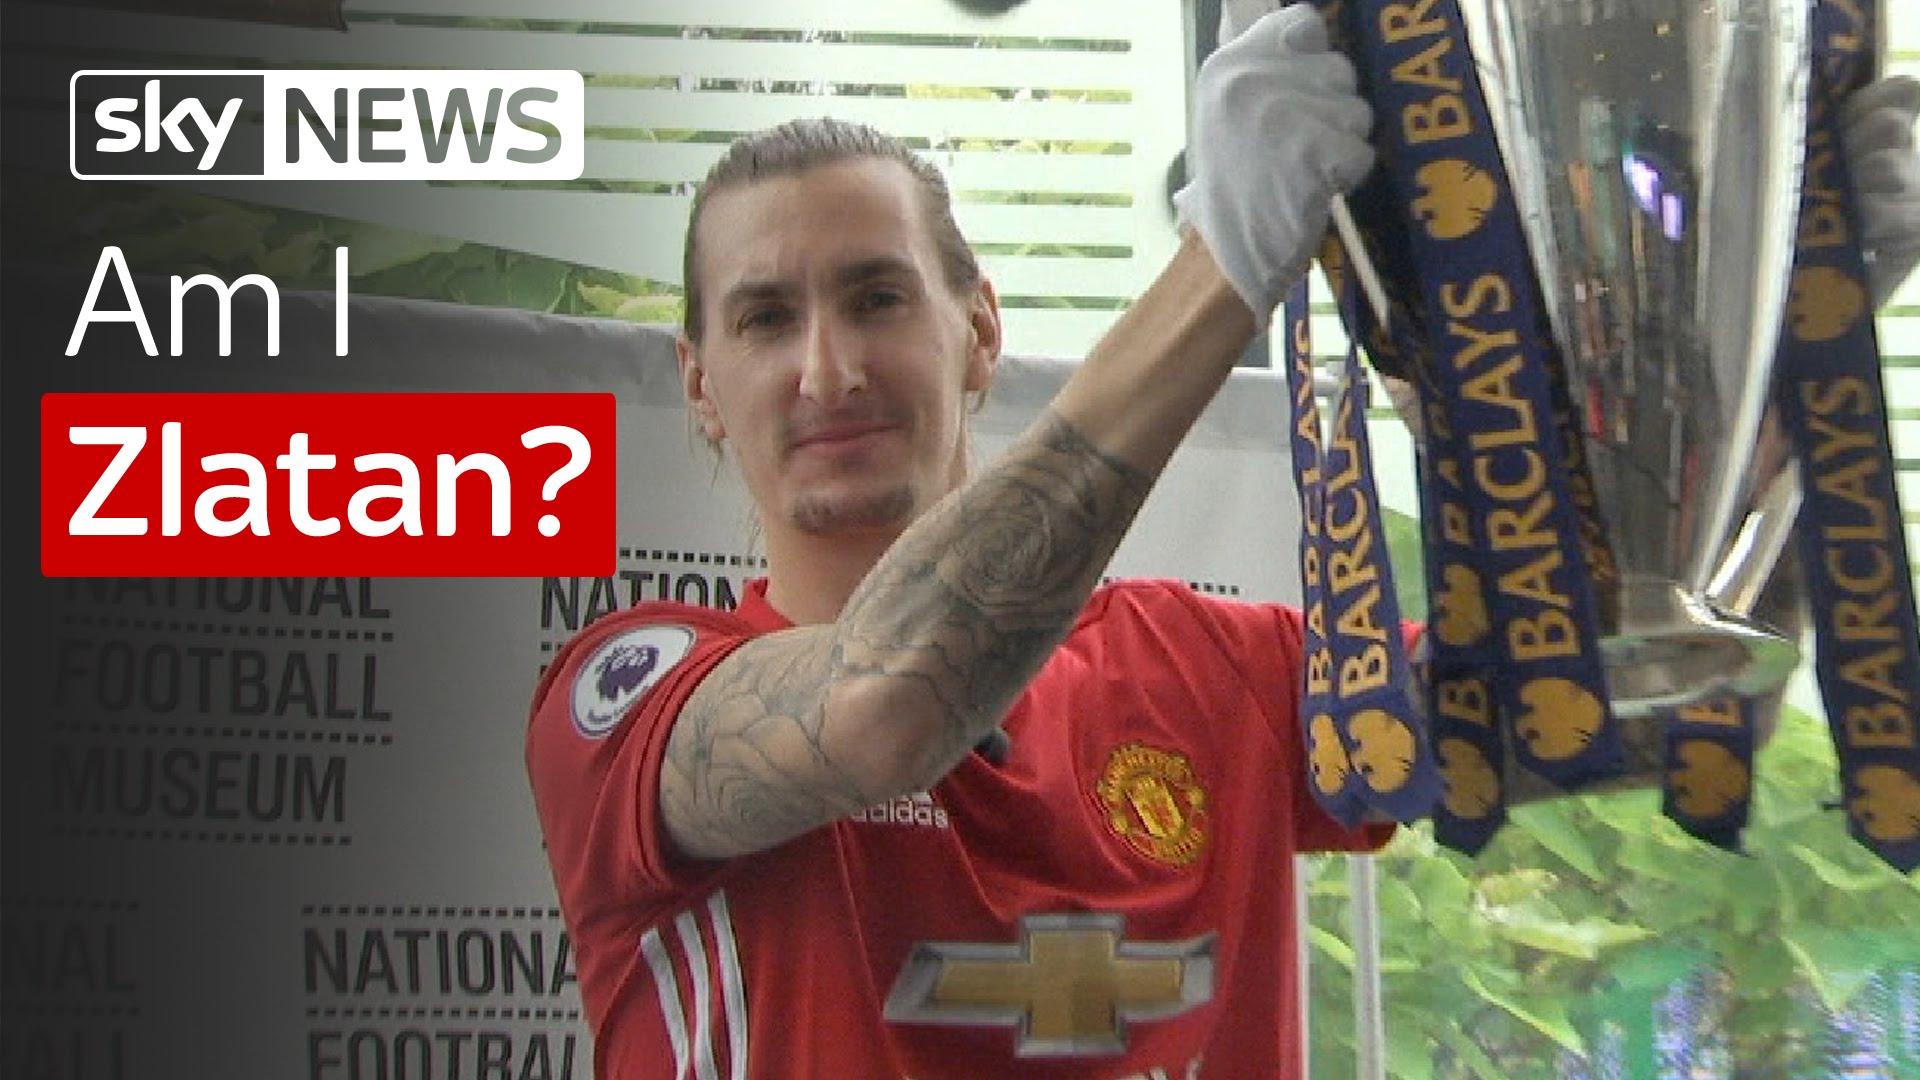 Am I Zlatan Ibrahimović? 6